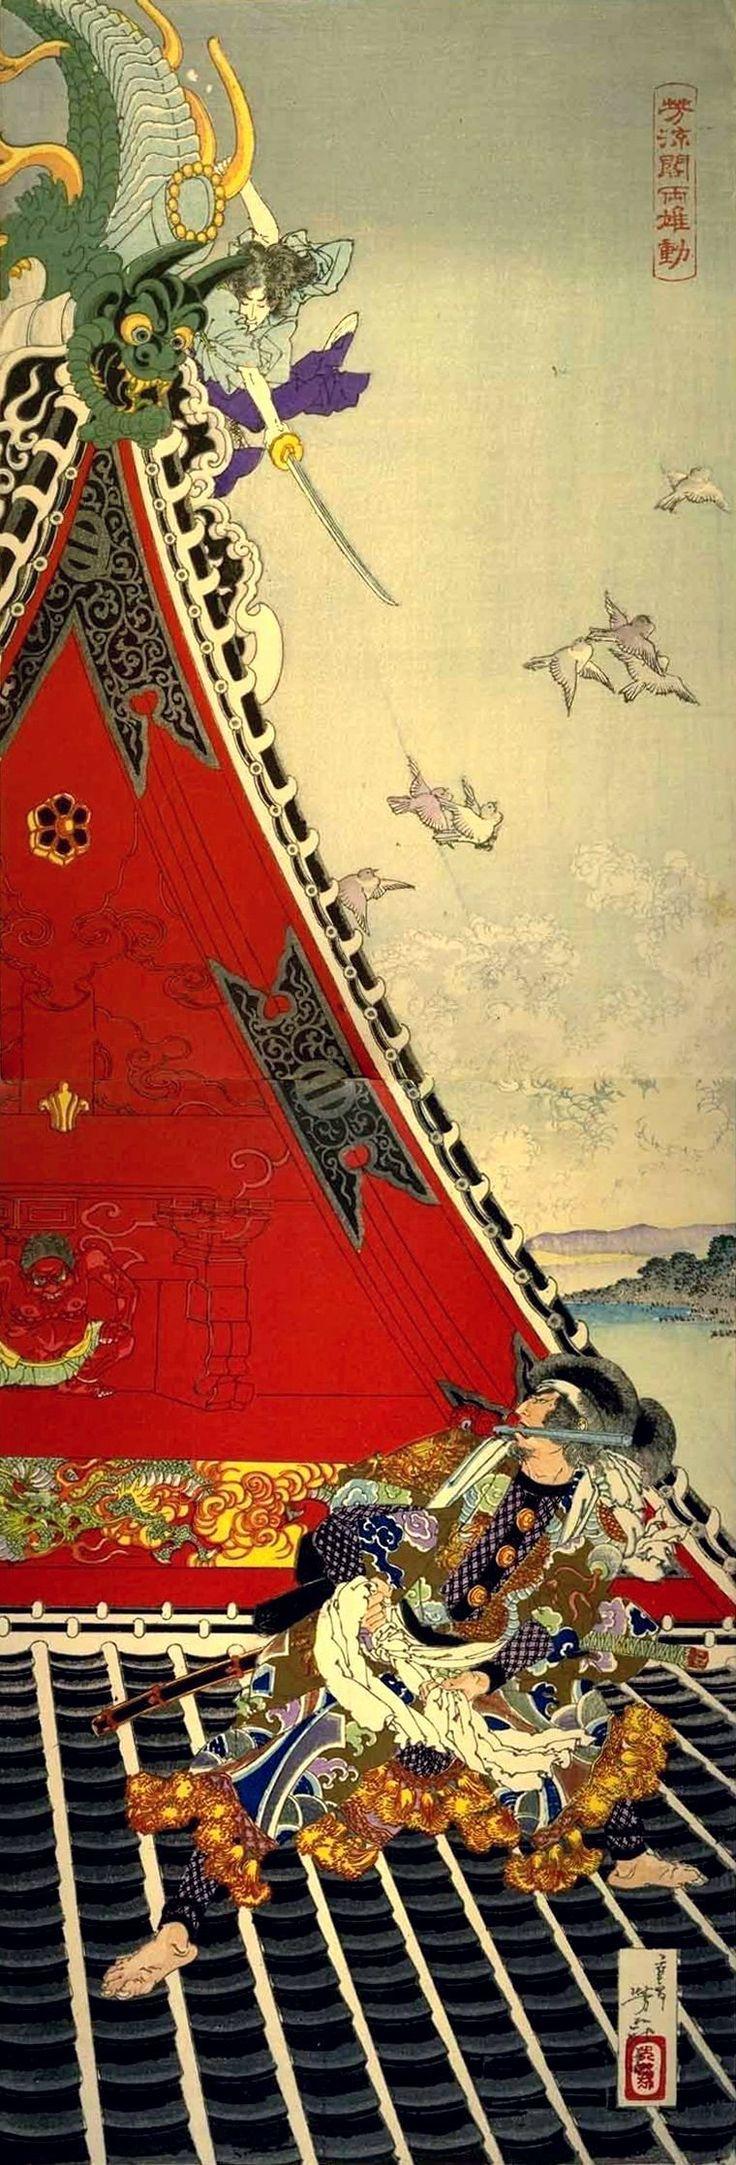 need this print:Tsukioka Yoshitoshi, Two Heroes in Battle at Horyūkakū, 1885